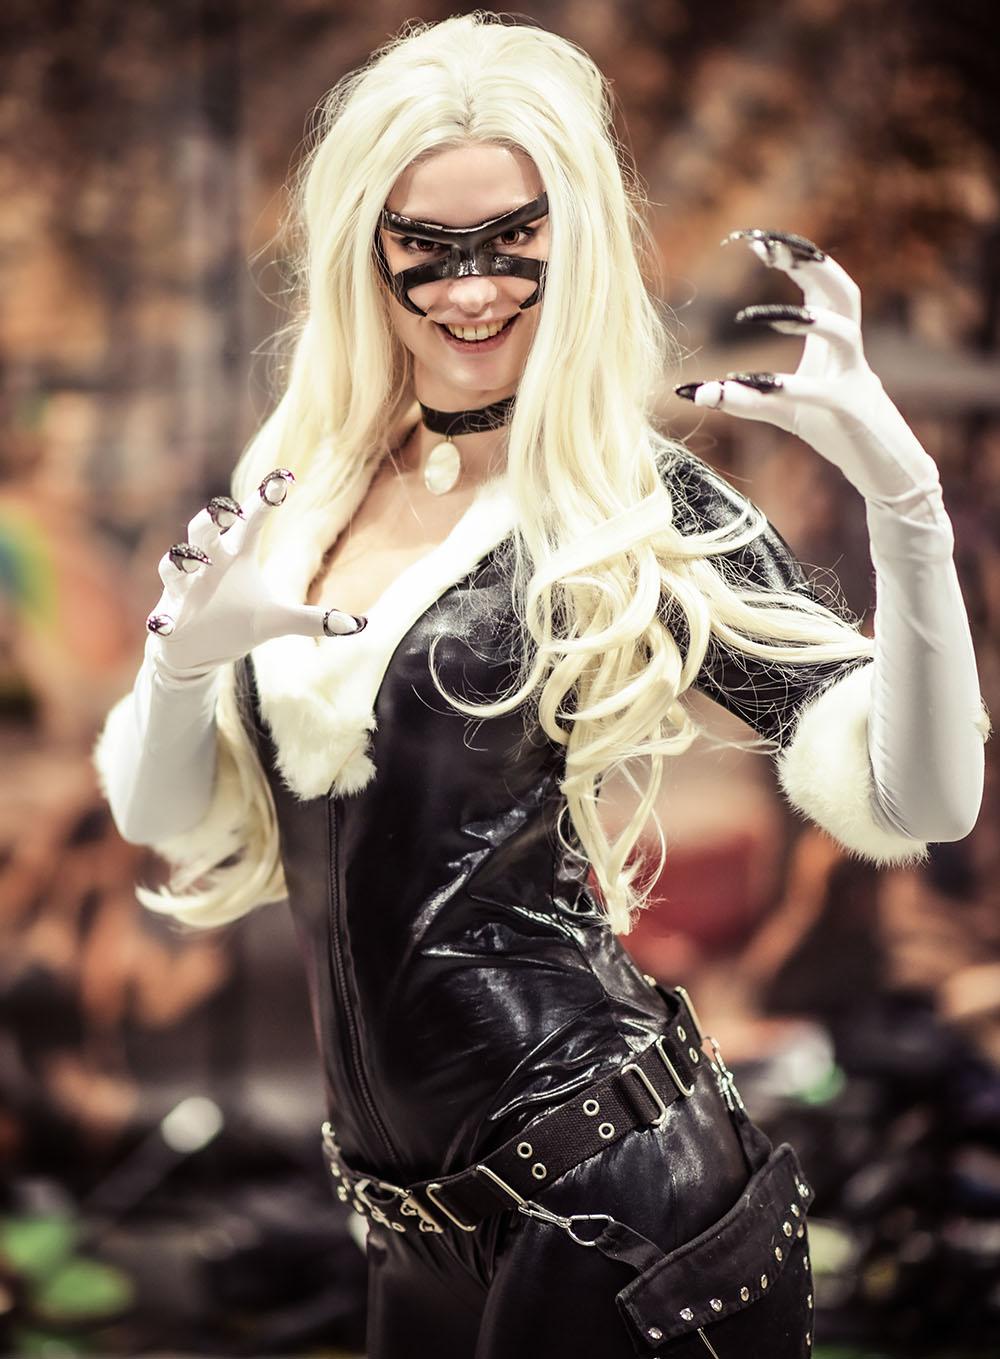 Blackcat Dutch Comic Con 2019